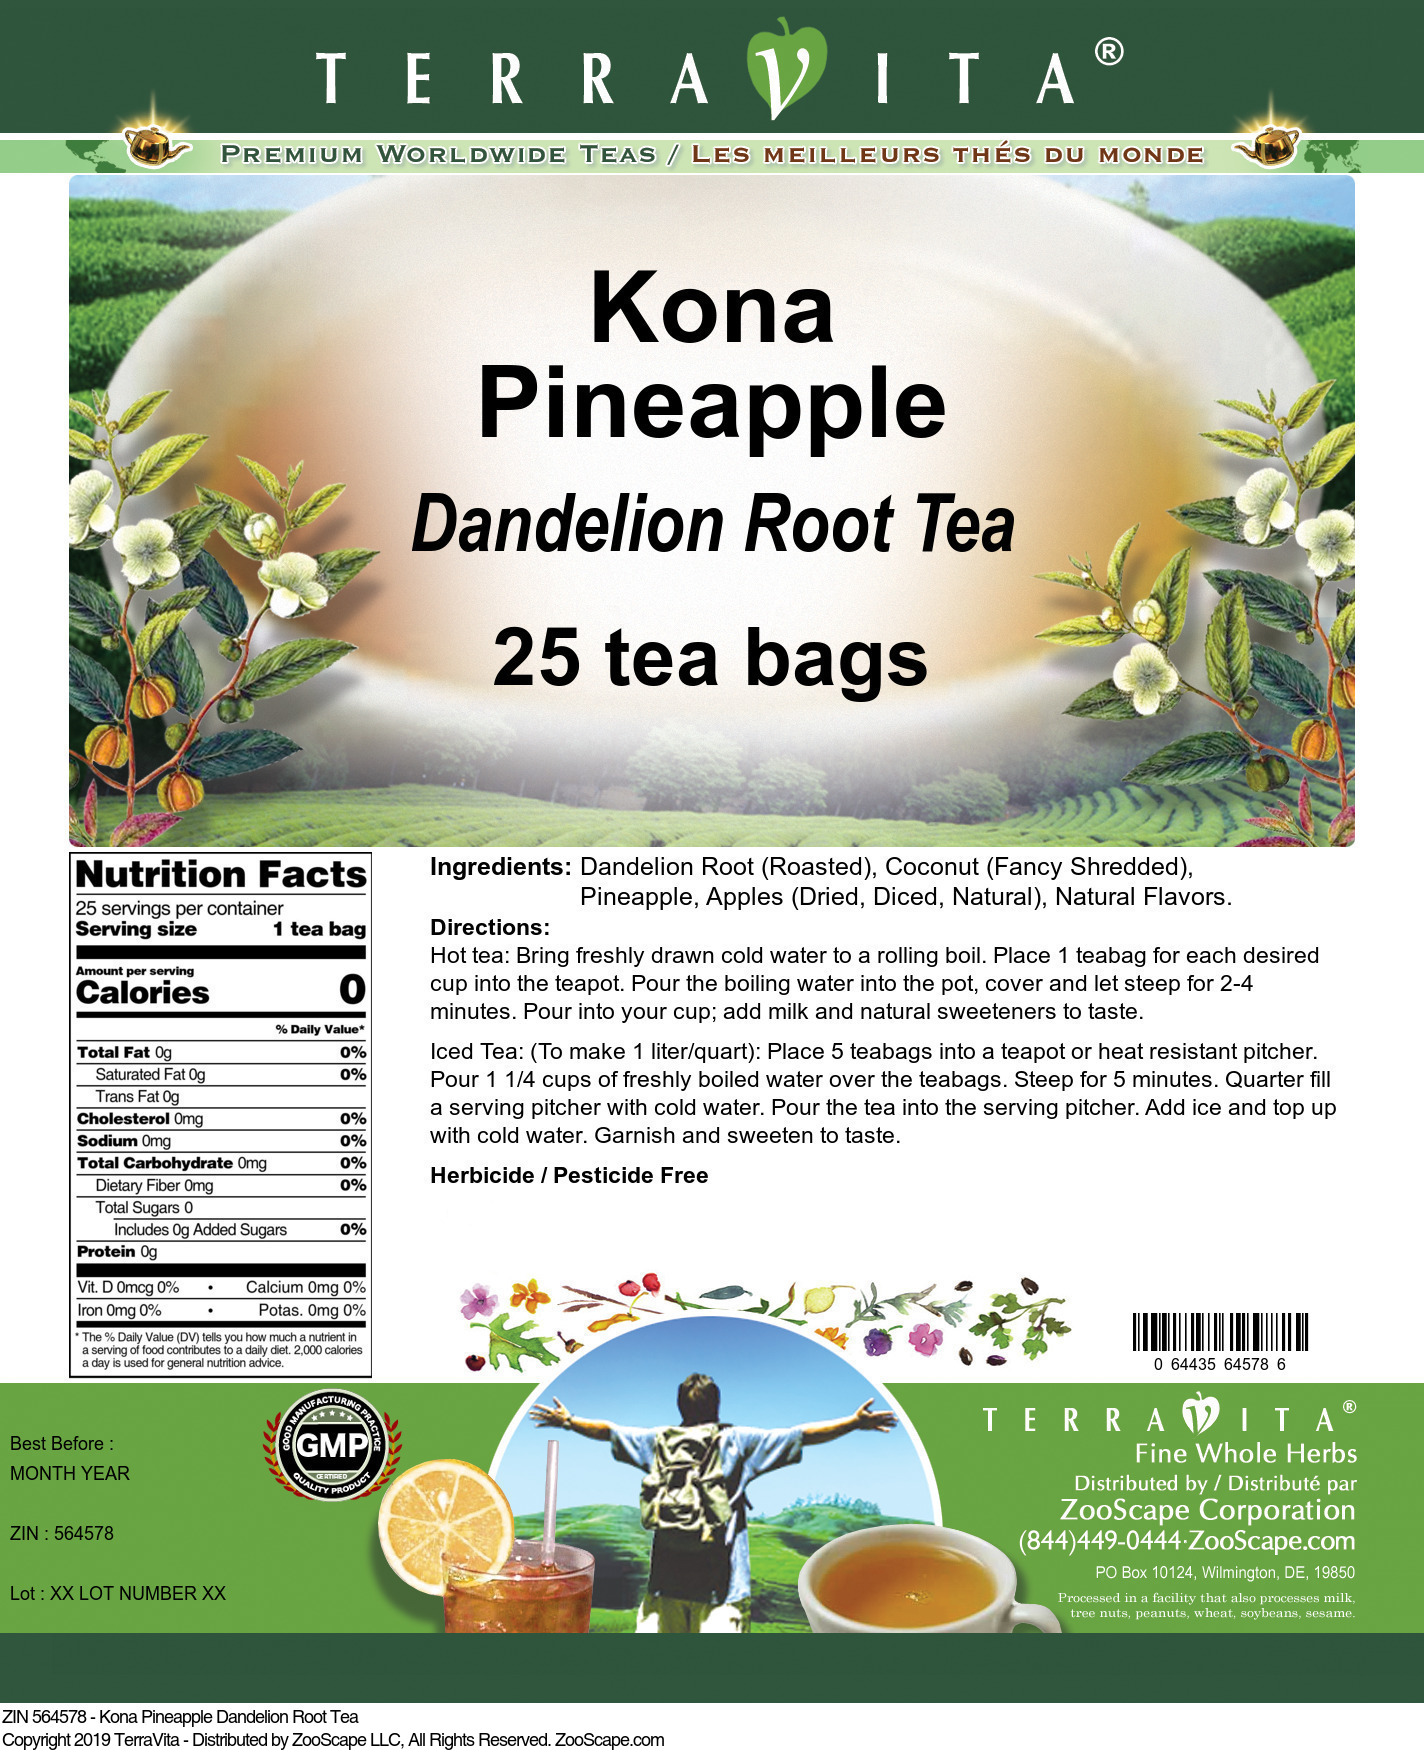 Kona Pineapple Dandelion Root